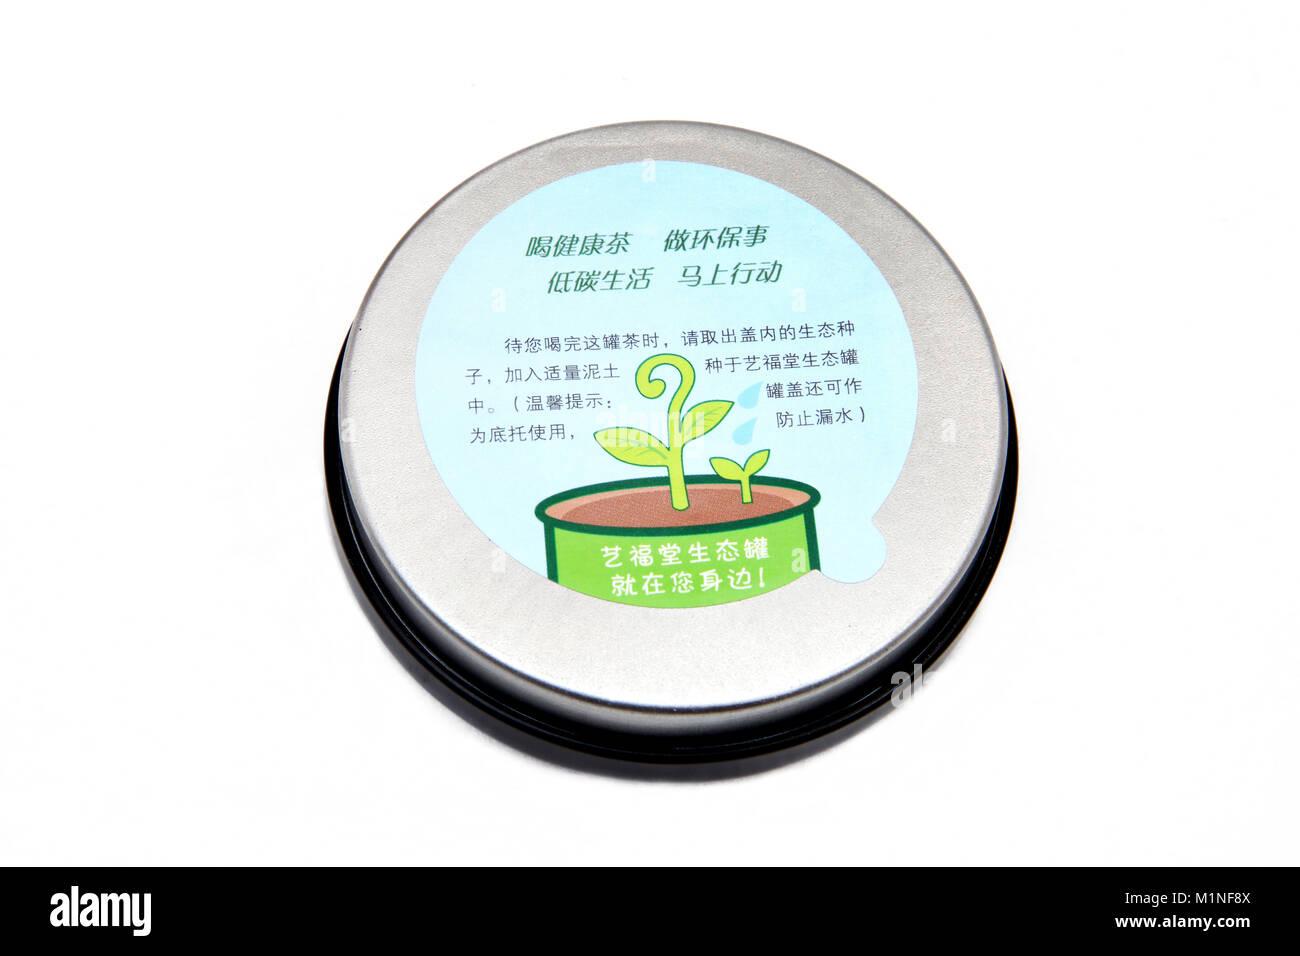 Cajevi, kafe i ostali bezalkohol - Page 5 Efuton-chinese-hawthorn-flower-tea-seed-in-tin-lid-M1NF8X